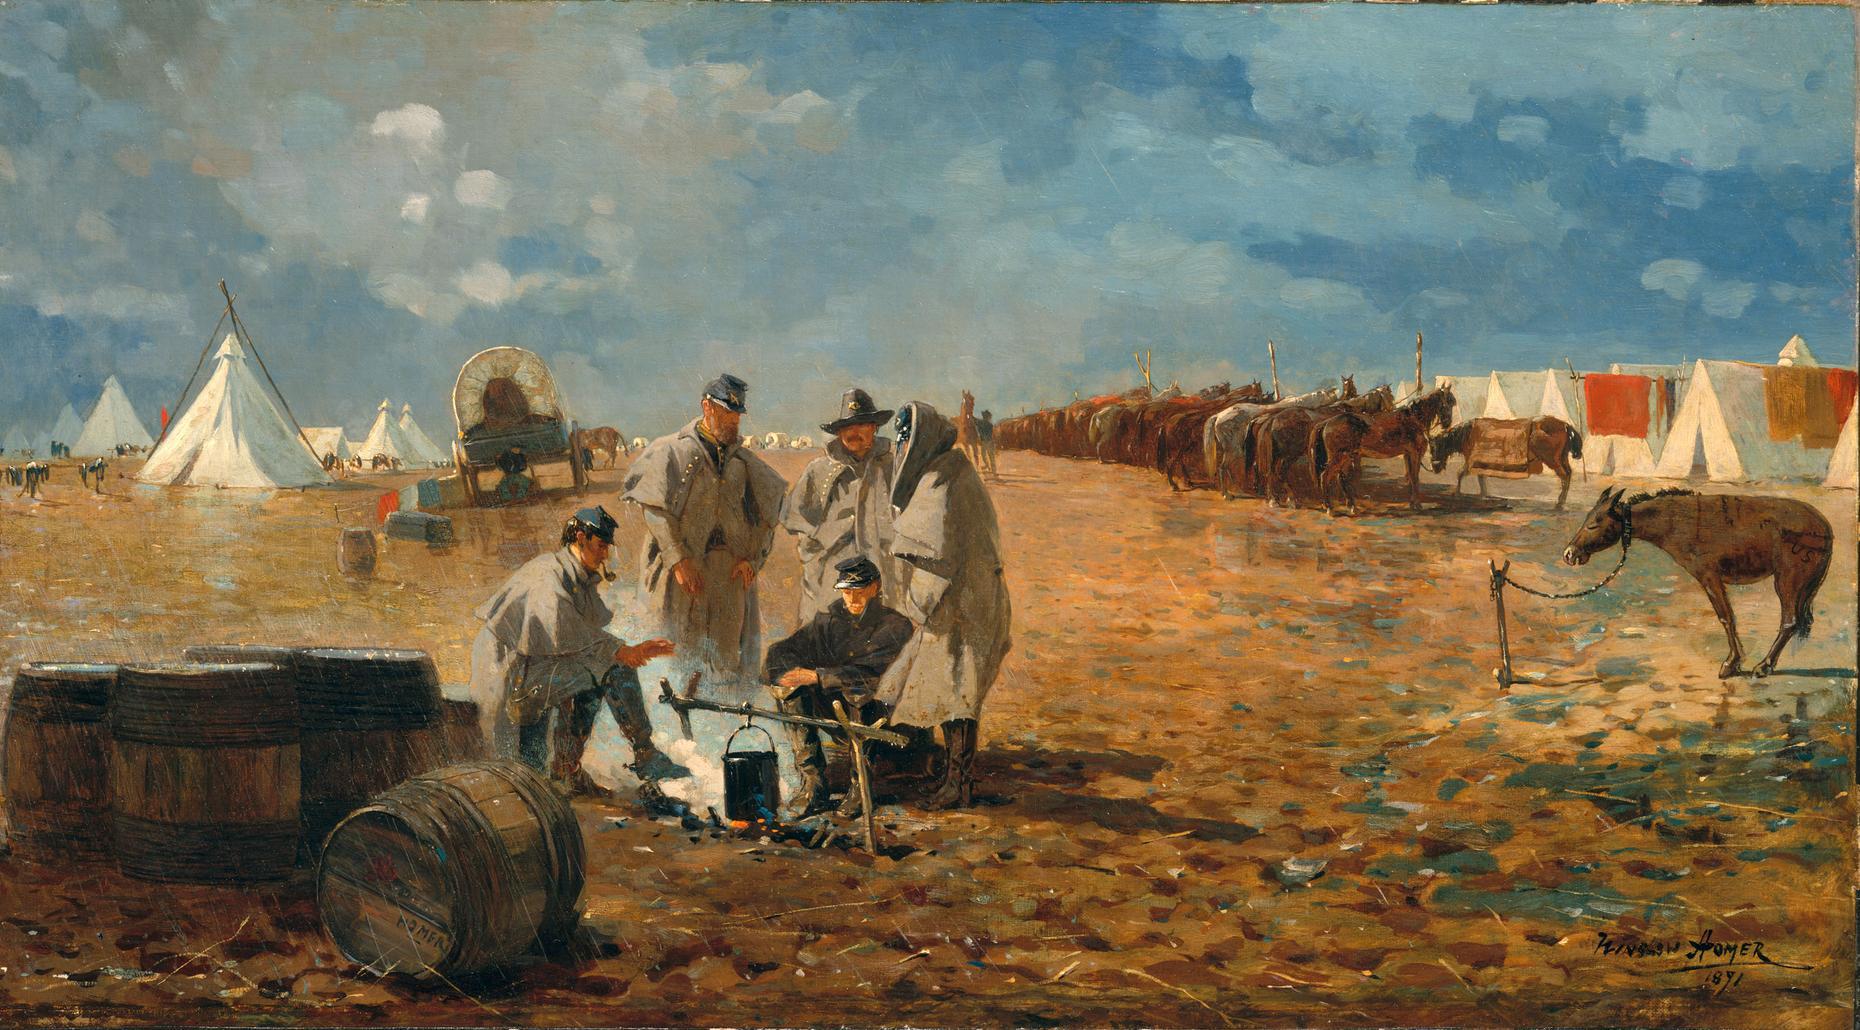 Winslow Homer, Rainy Day at Camp. 1871